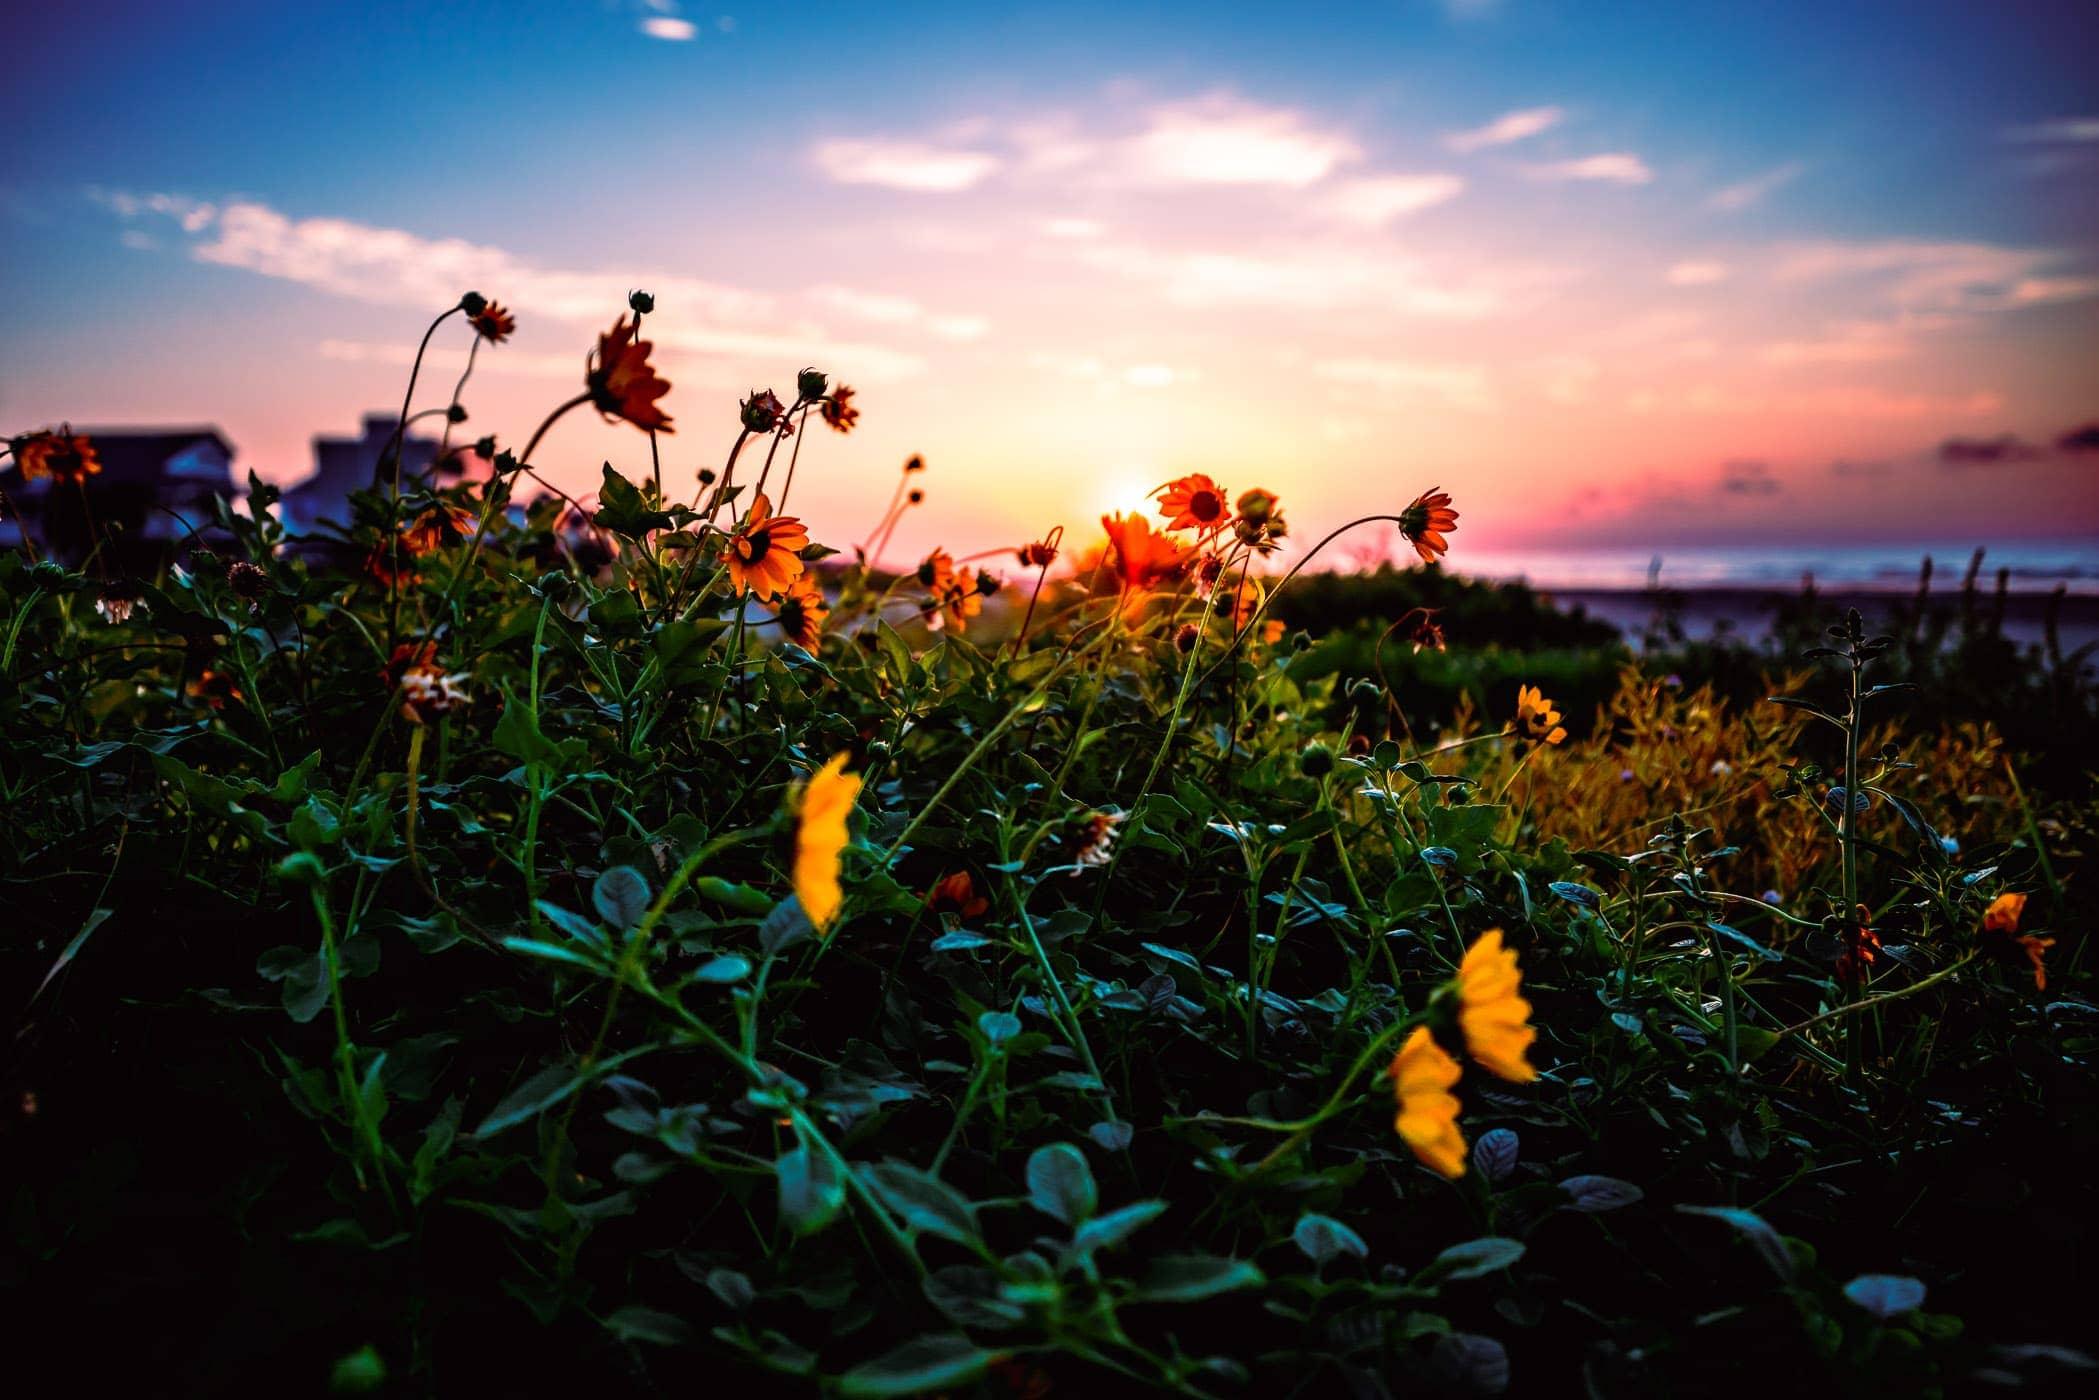 Flowers amongst the sand dunes on Texas' Galveston Island.